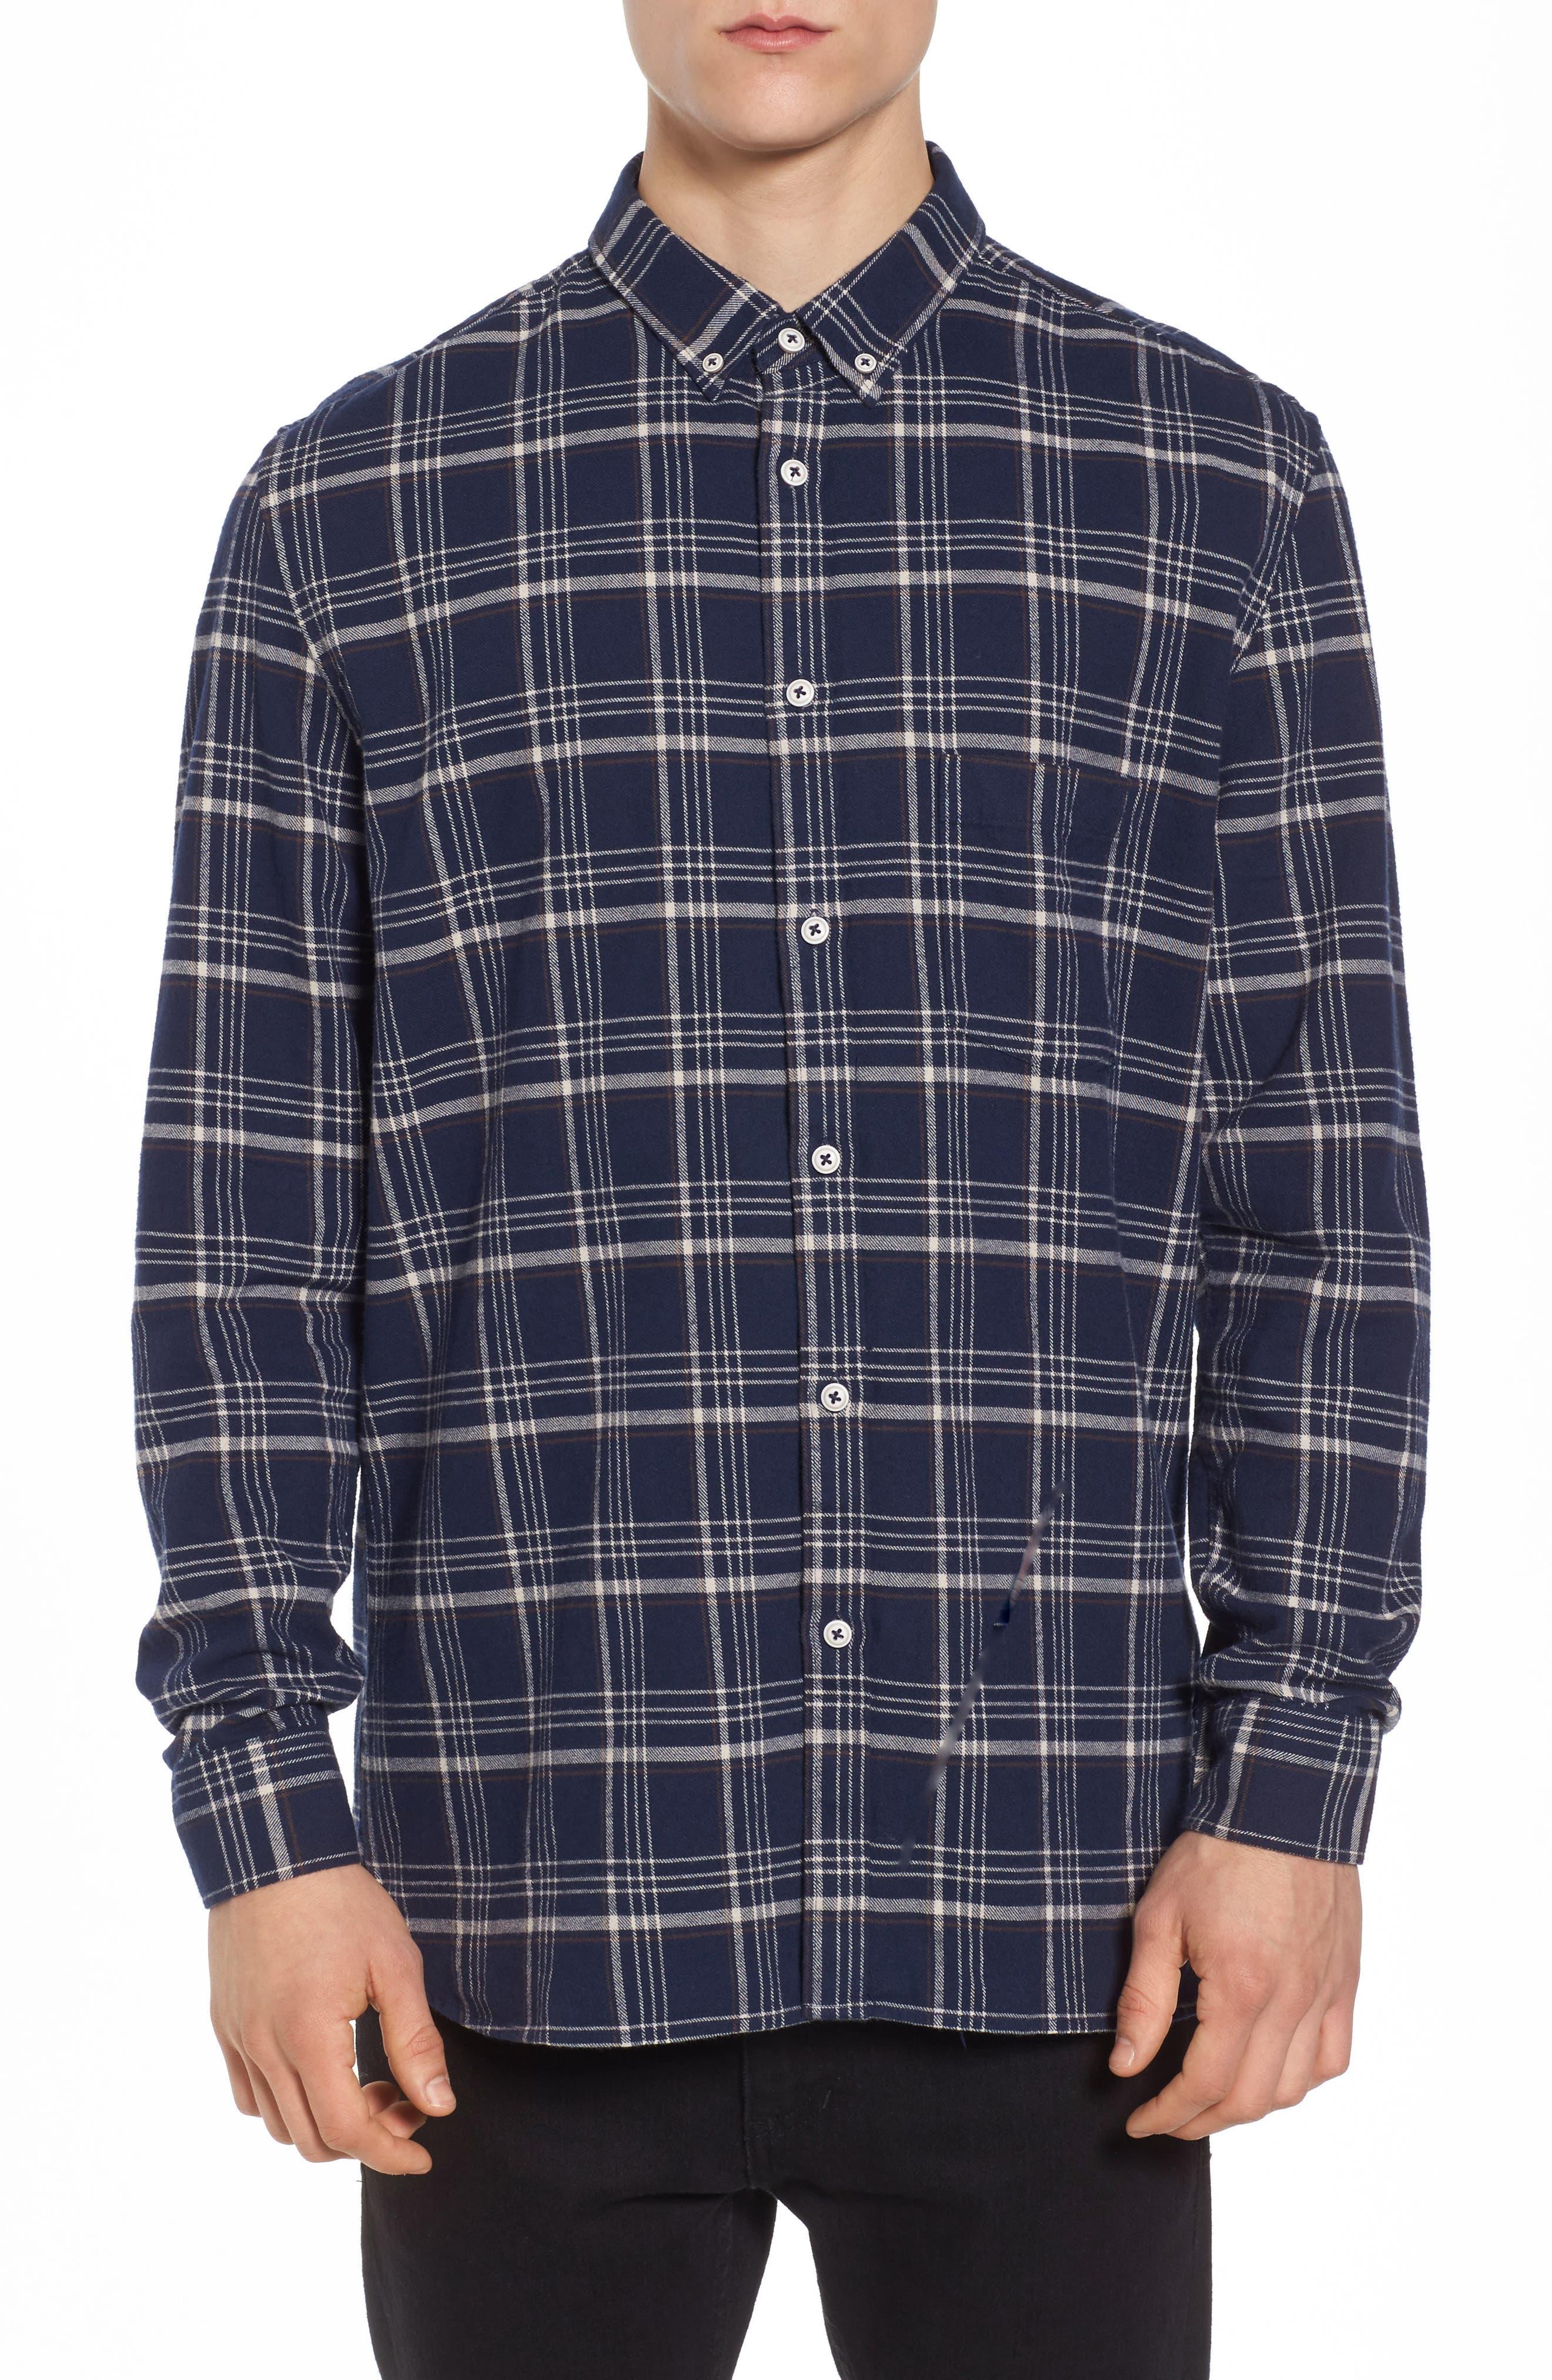 Barney Cools Cabin Plaid Shirt